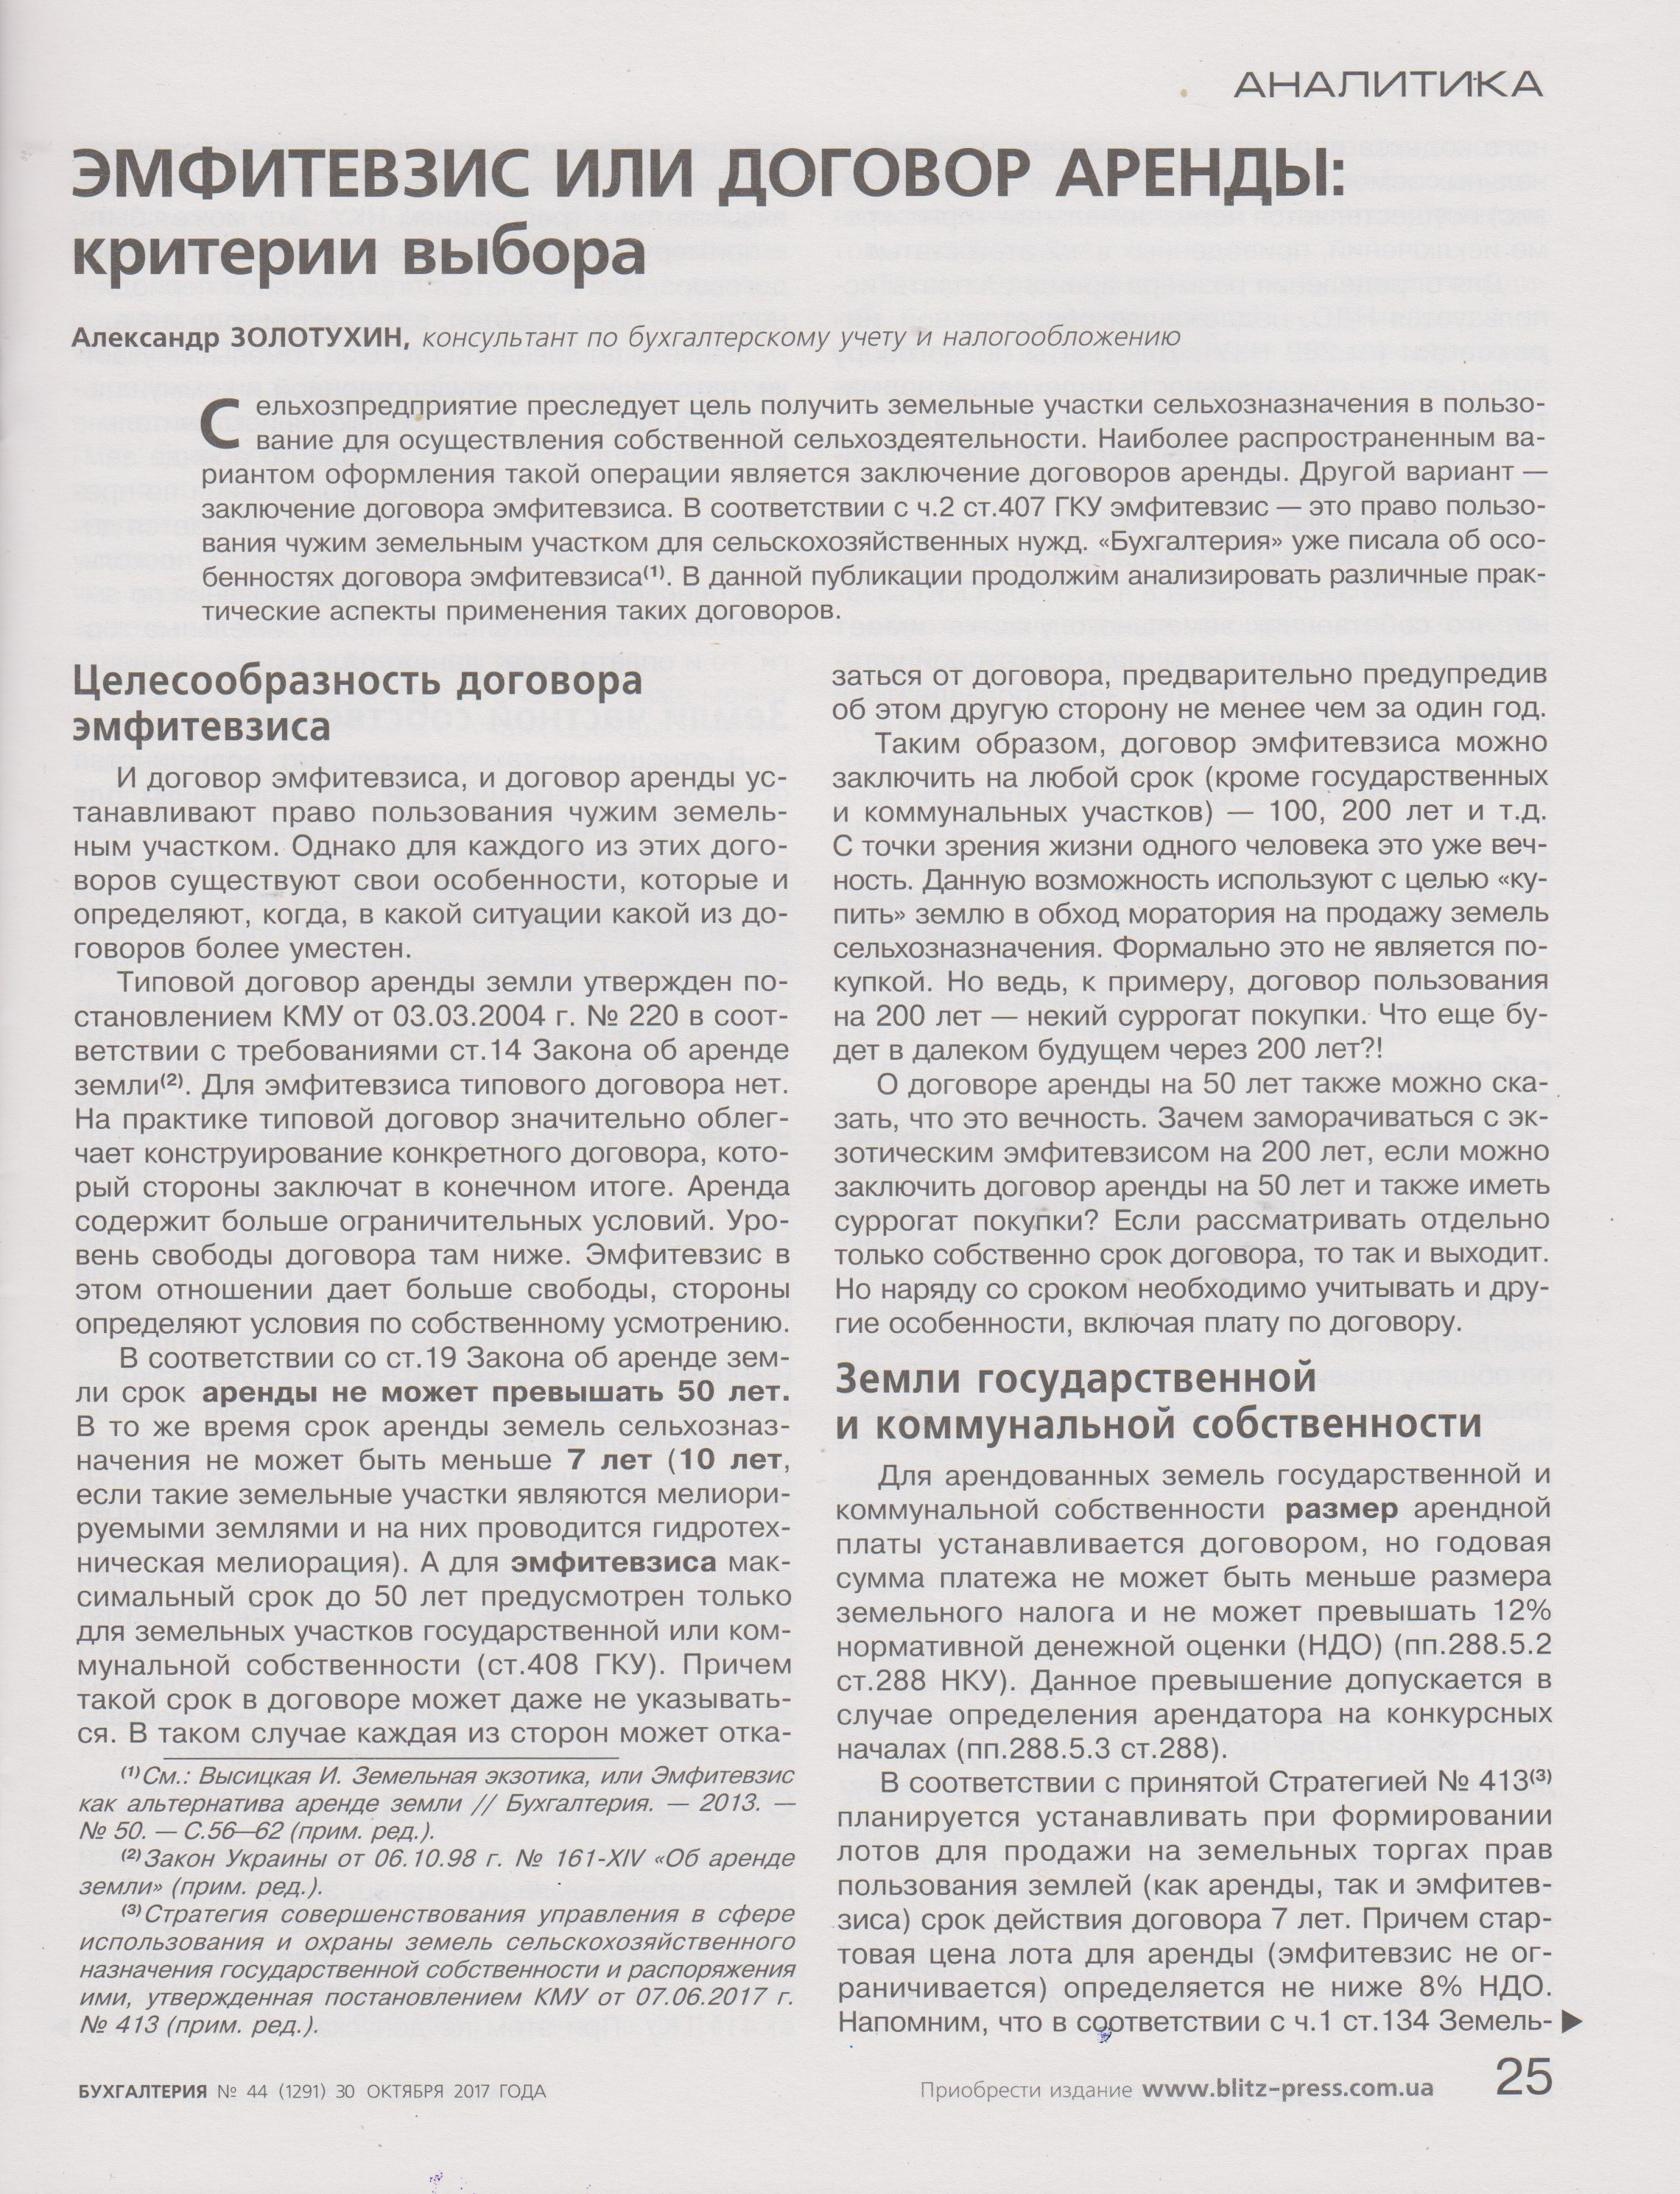 эмфитевзис